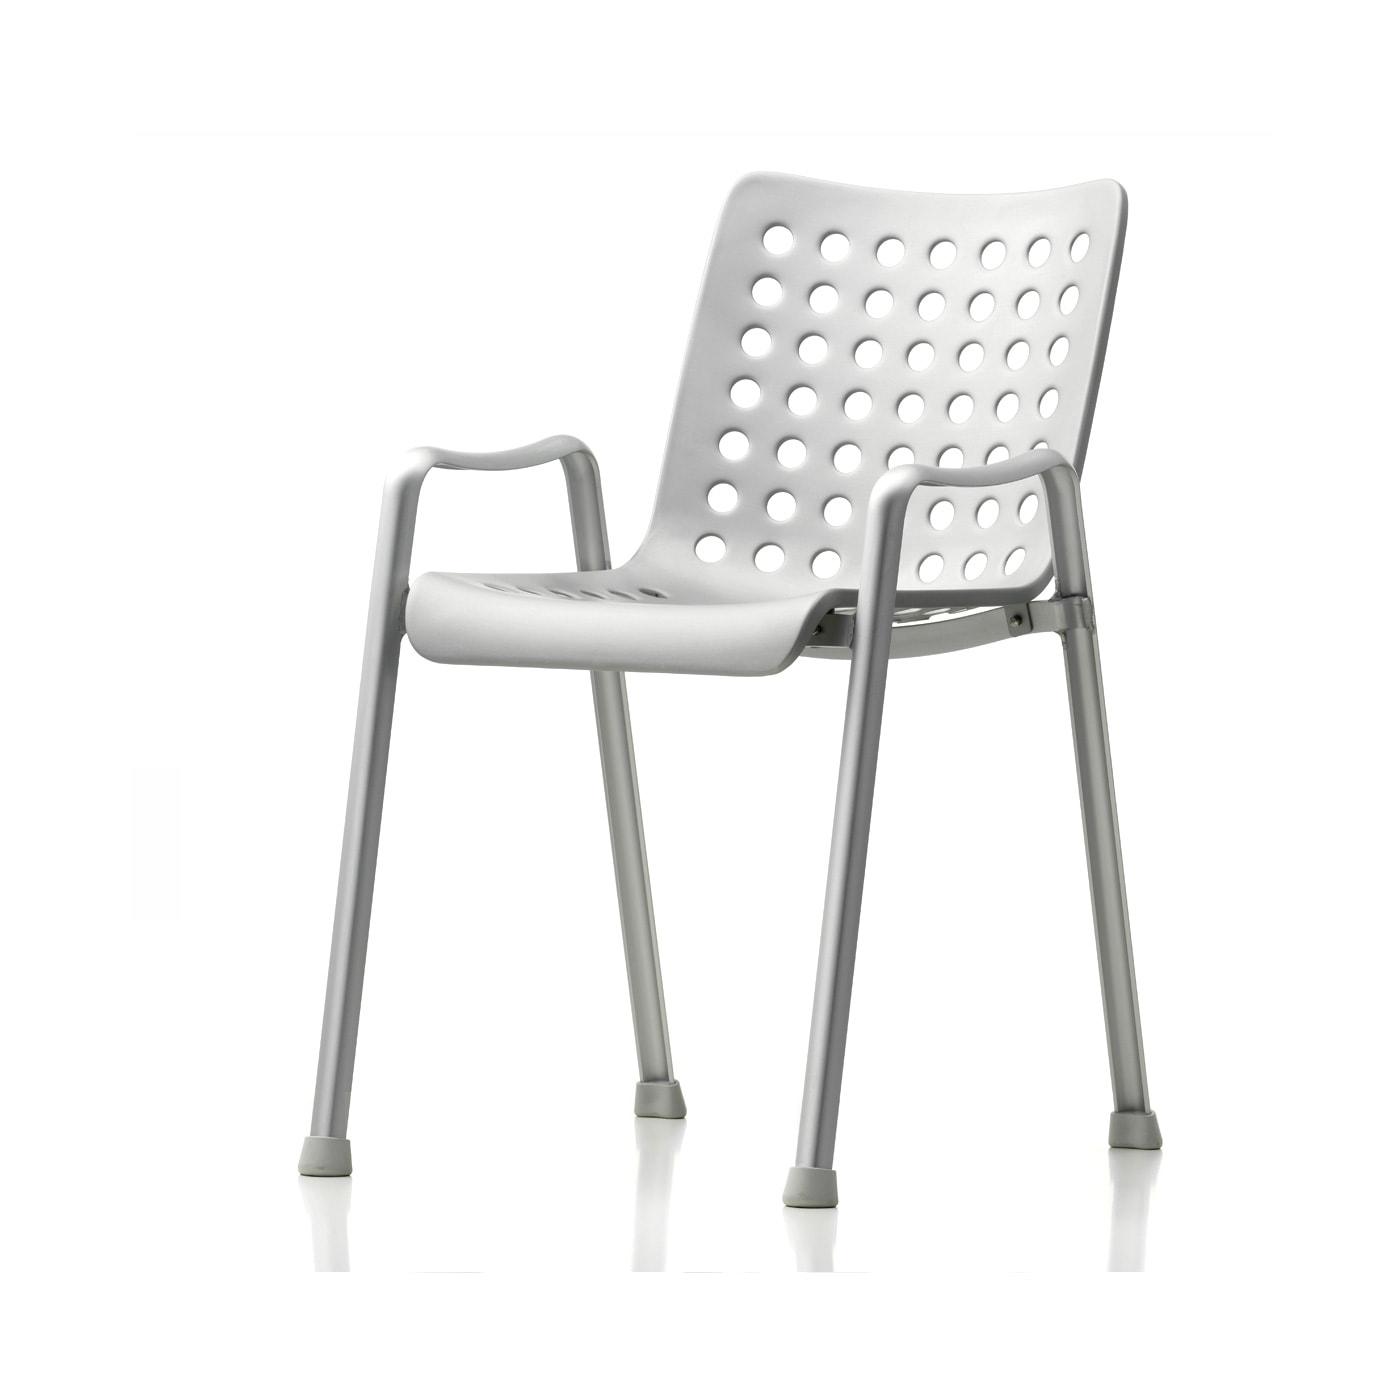 VITRA Landi sedia alluminio